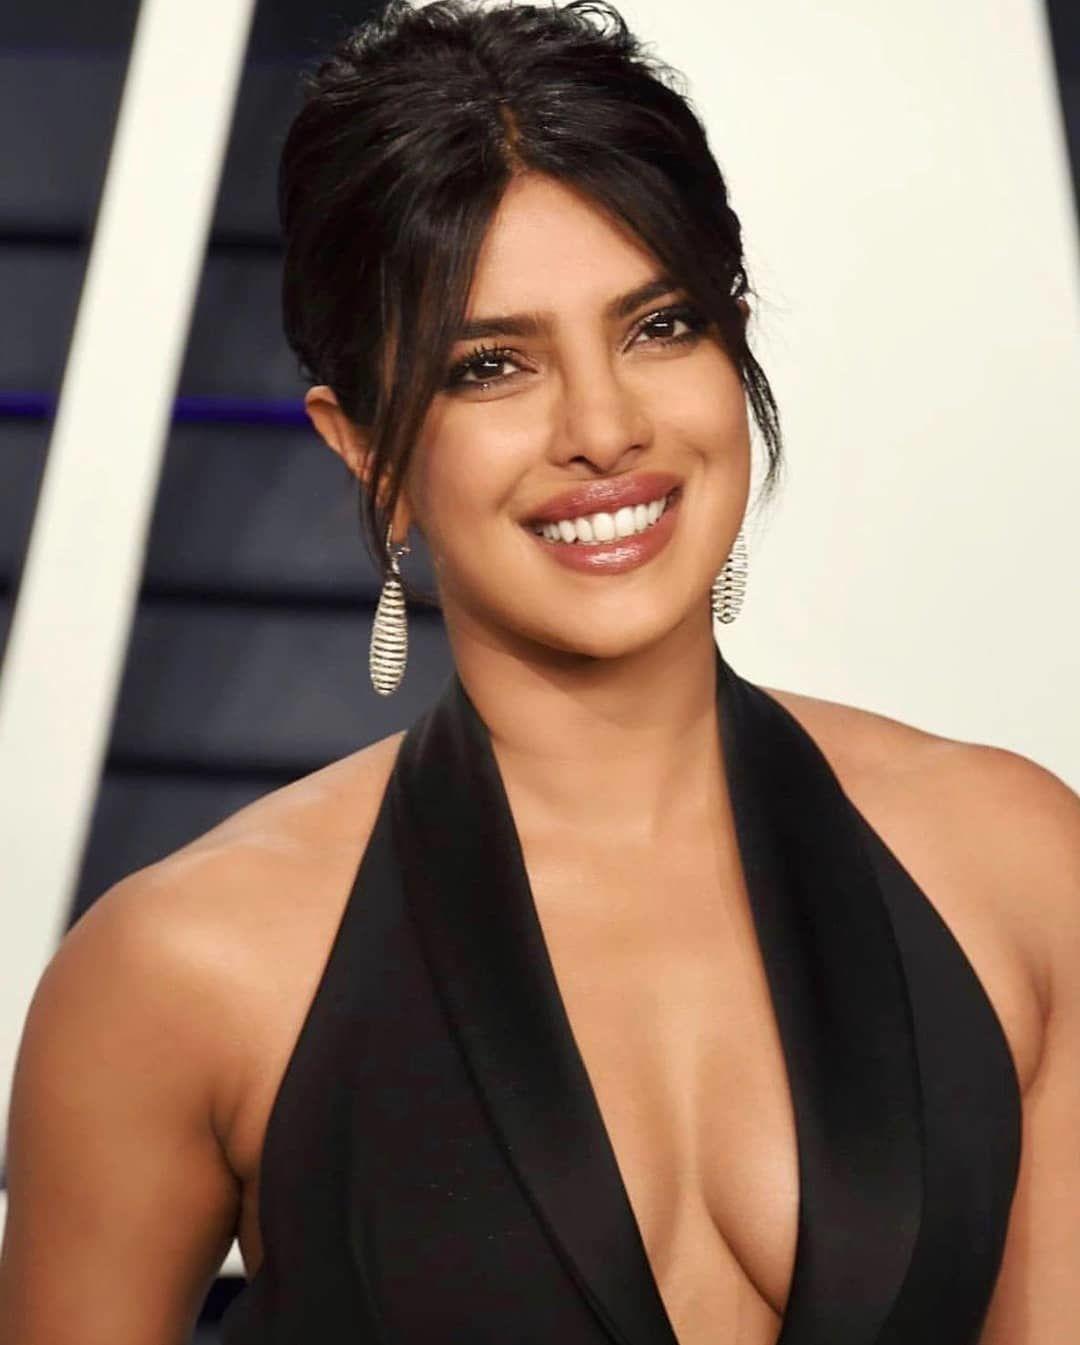 Setelah Avengers, Priyanka Chopra Jadi Superhero Muslim Marvel?